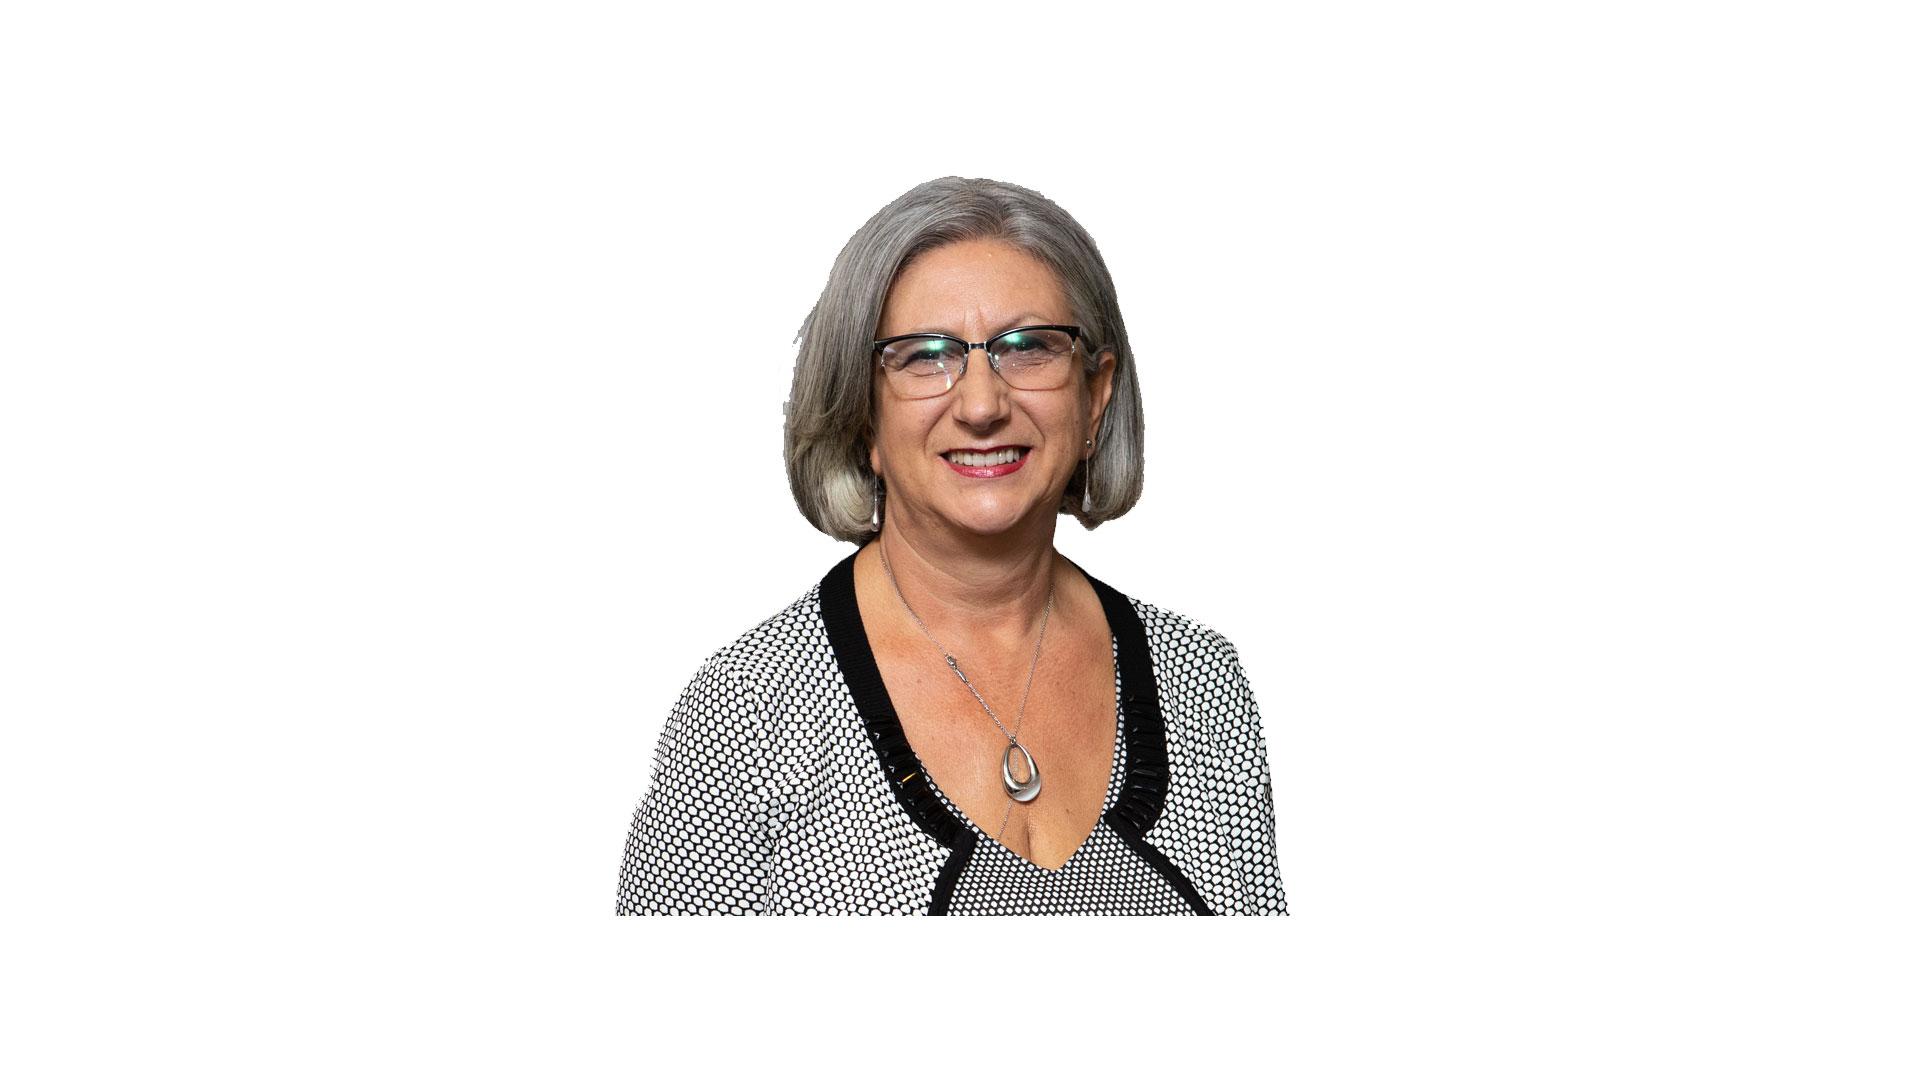 Carbonelli Maria Grazia